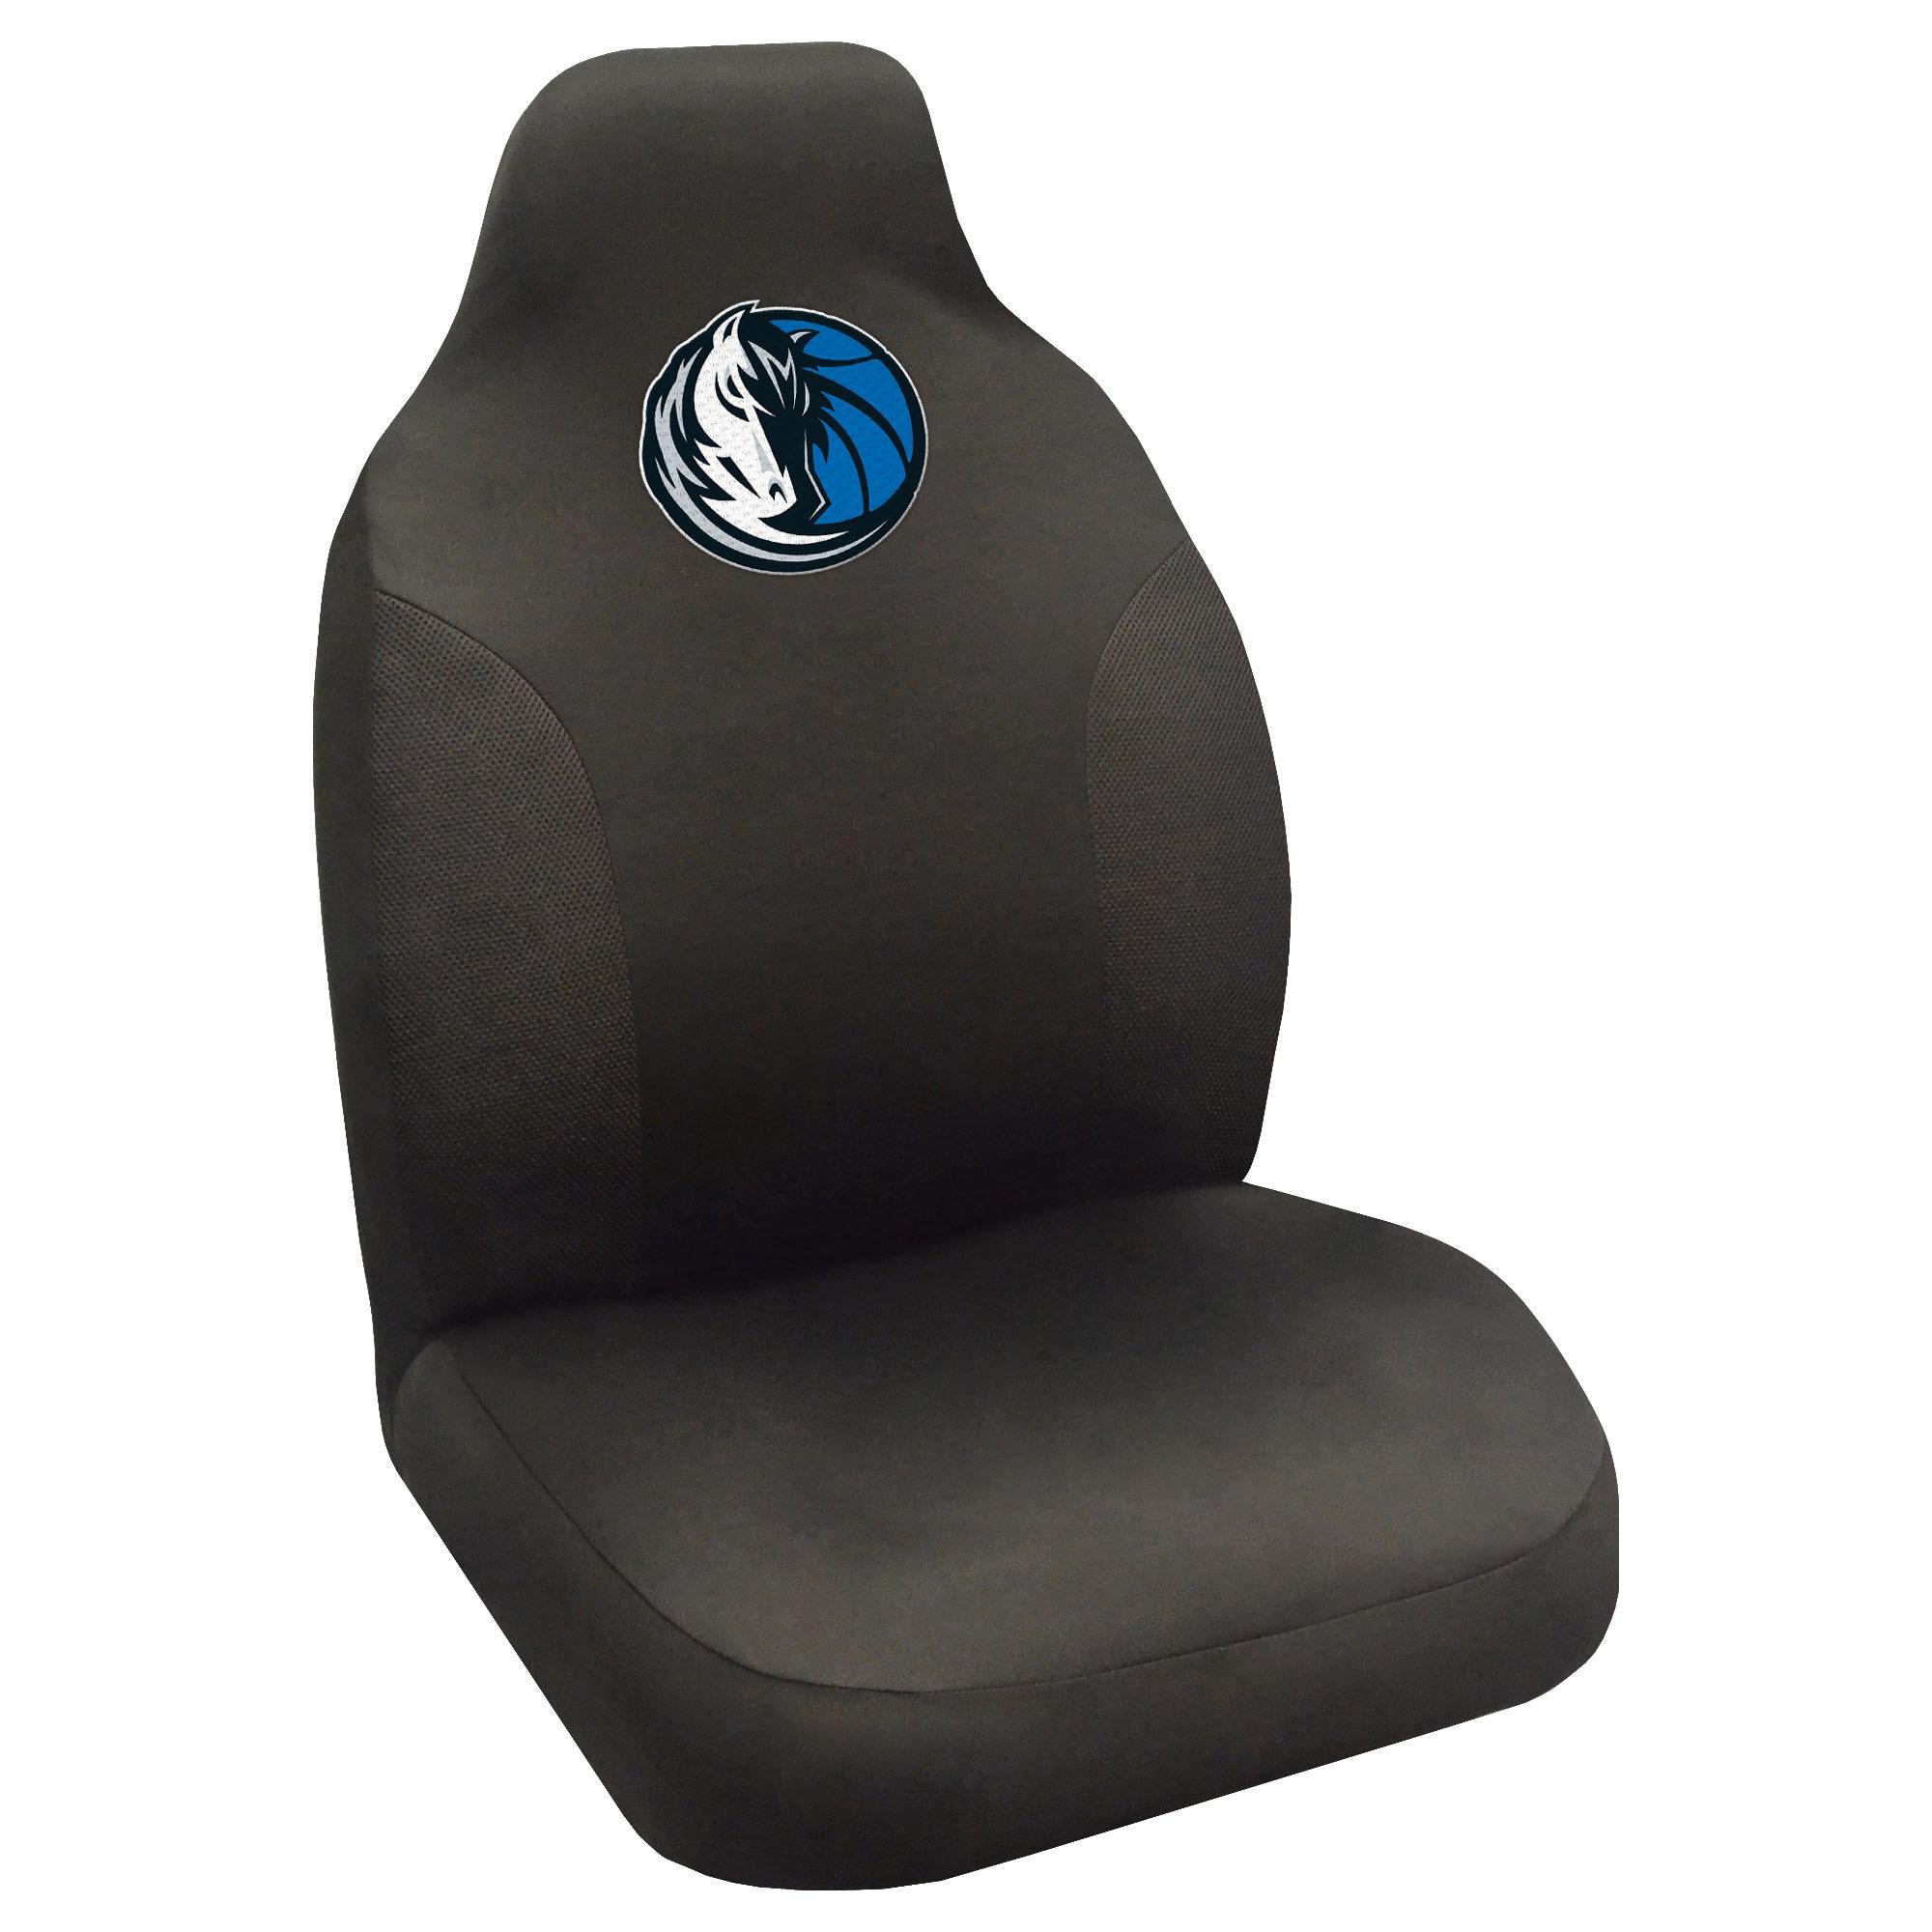 Dallas Mavericks Car Seat Cover